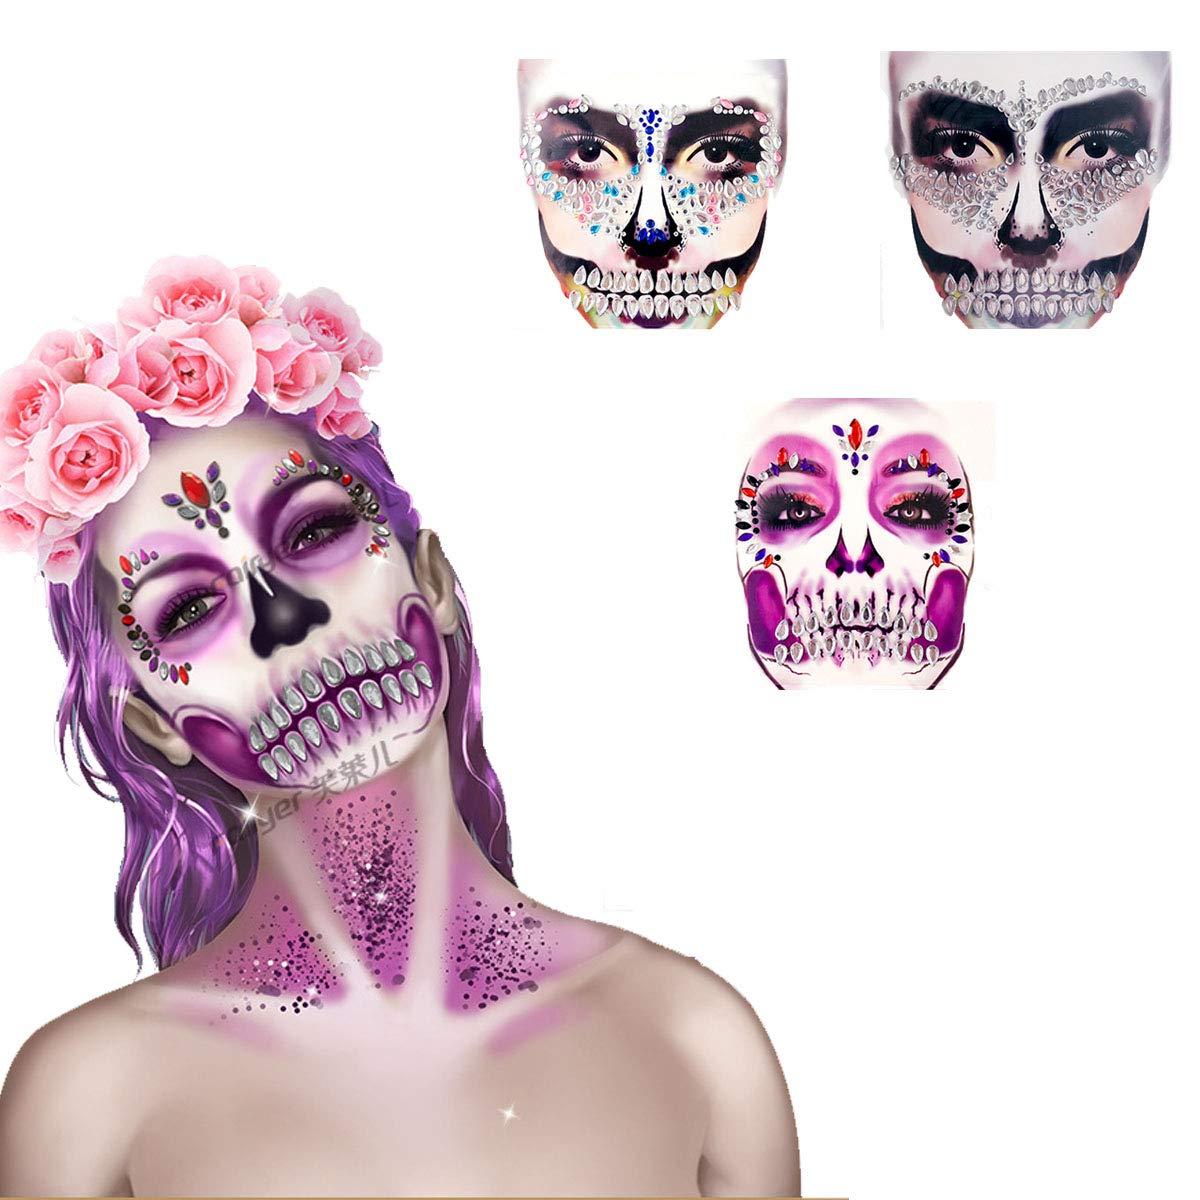 Day of the Dead Halloween Diamond Face Tattoos Face Diamond Stickers, Sugar Skull Face Tattoo Stickers Kit, Diamond Face Sticker Temporary Face Tattoo Stickers for Halloween, Masquerade (3sheets)